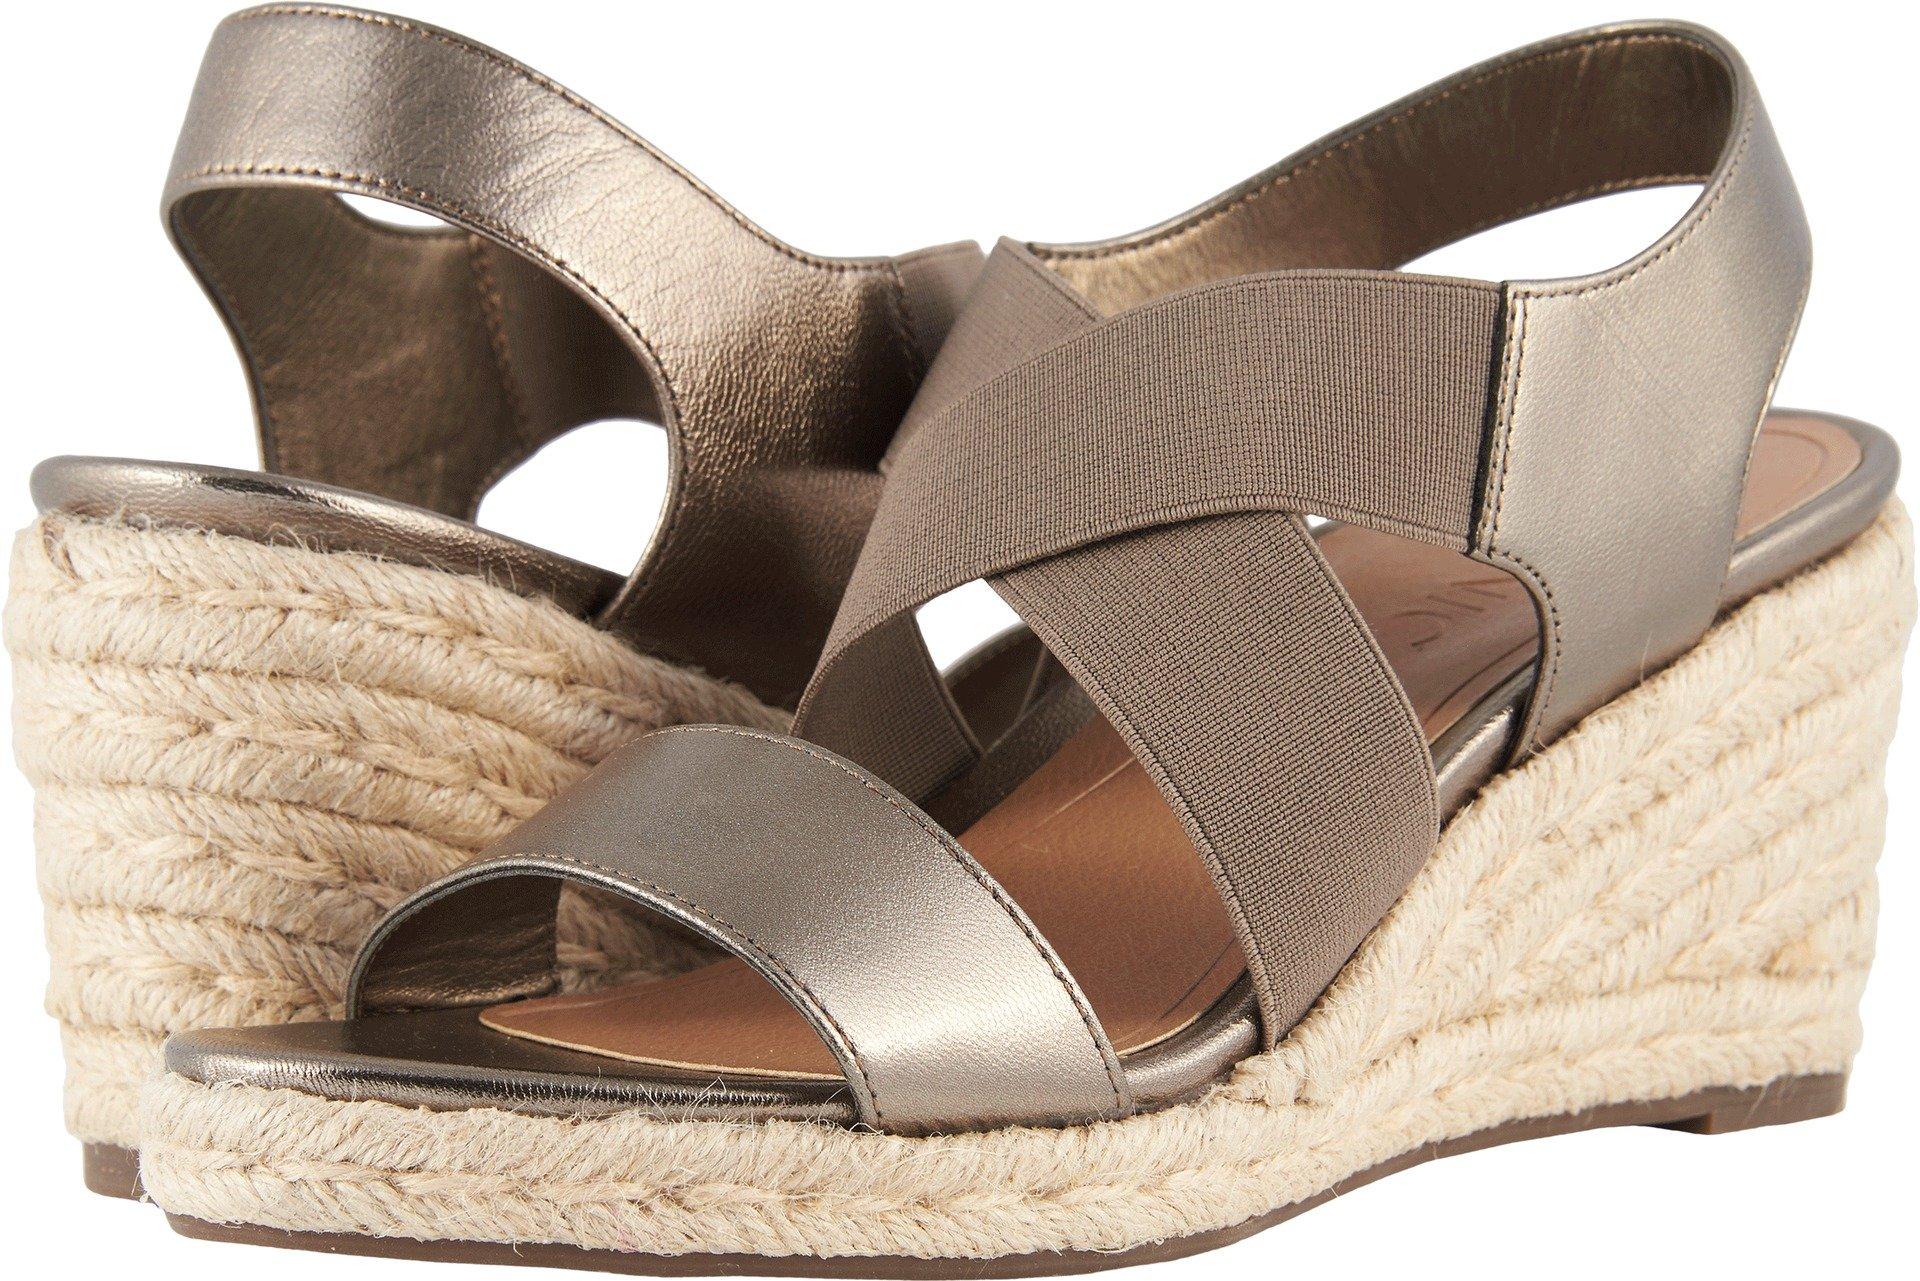 Vionic Tulum Ainsleigh - Womens Wedge Sandal Dark Taupe - 6.5 Medium